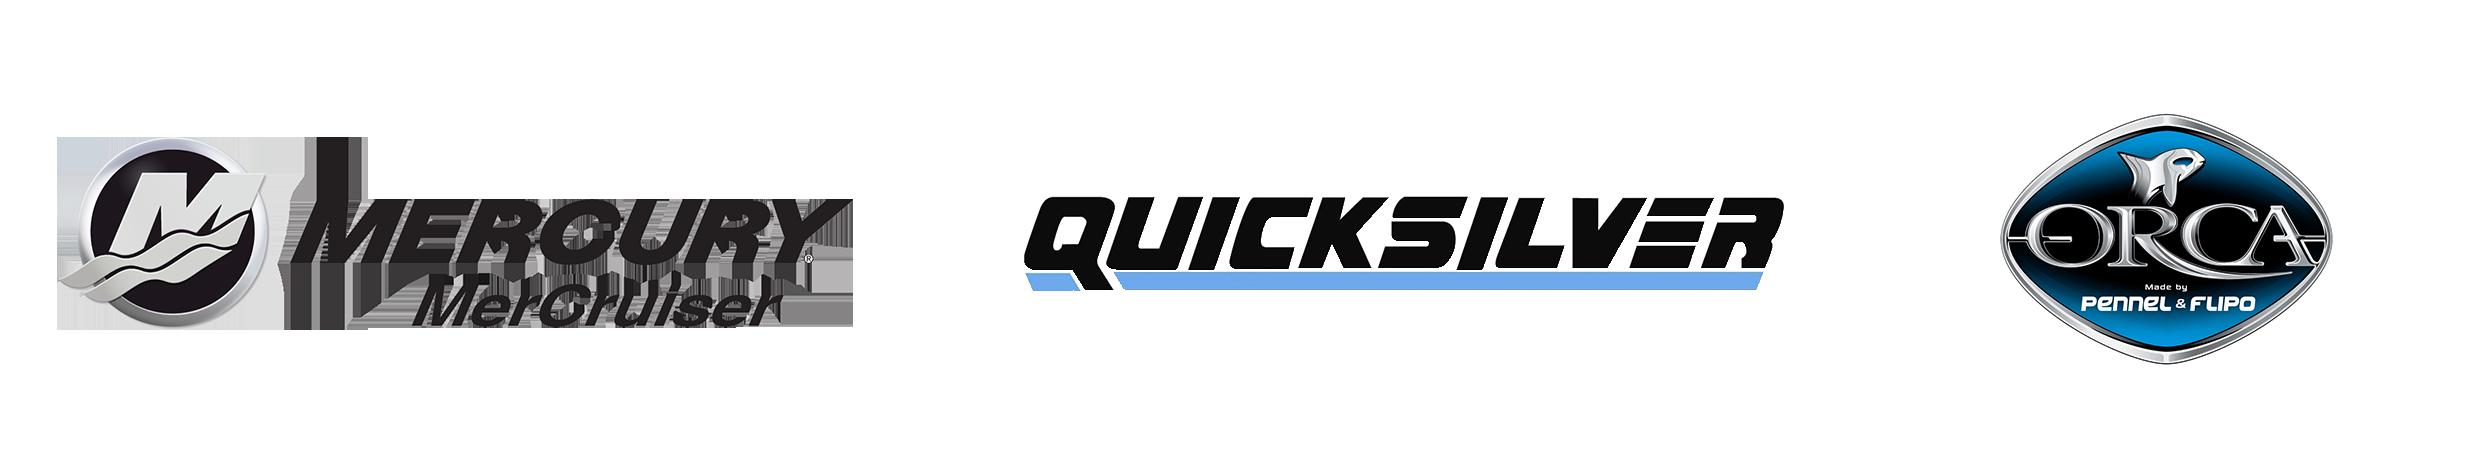 Entretien, réparation, vente Mercury & Mercruiser, Volvo, Yamaha, Selva, Jonhson Evinrude, Suzuki, Honda